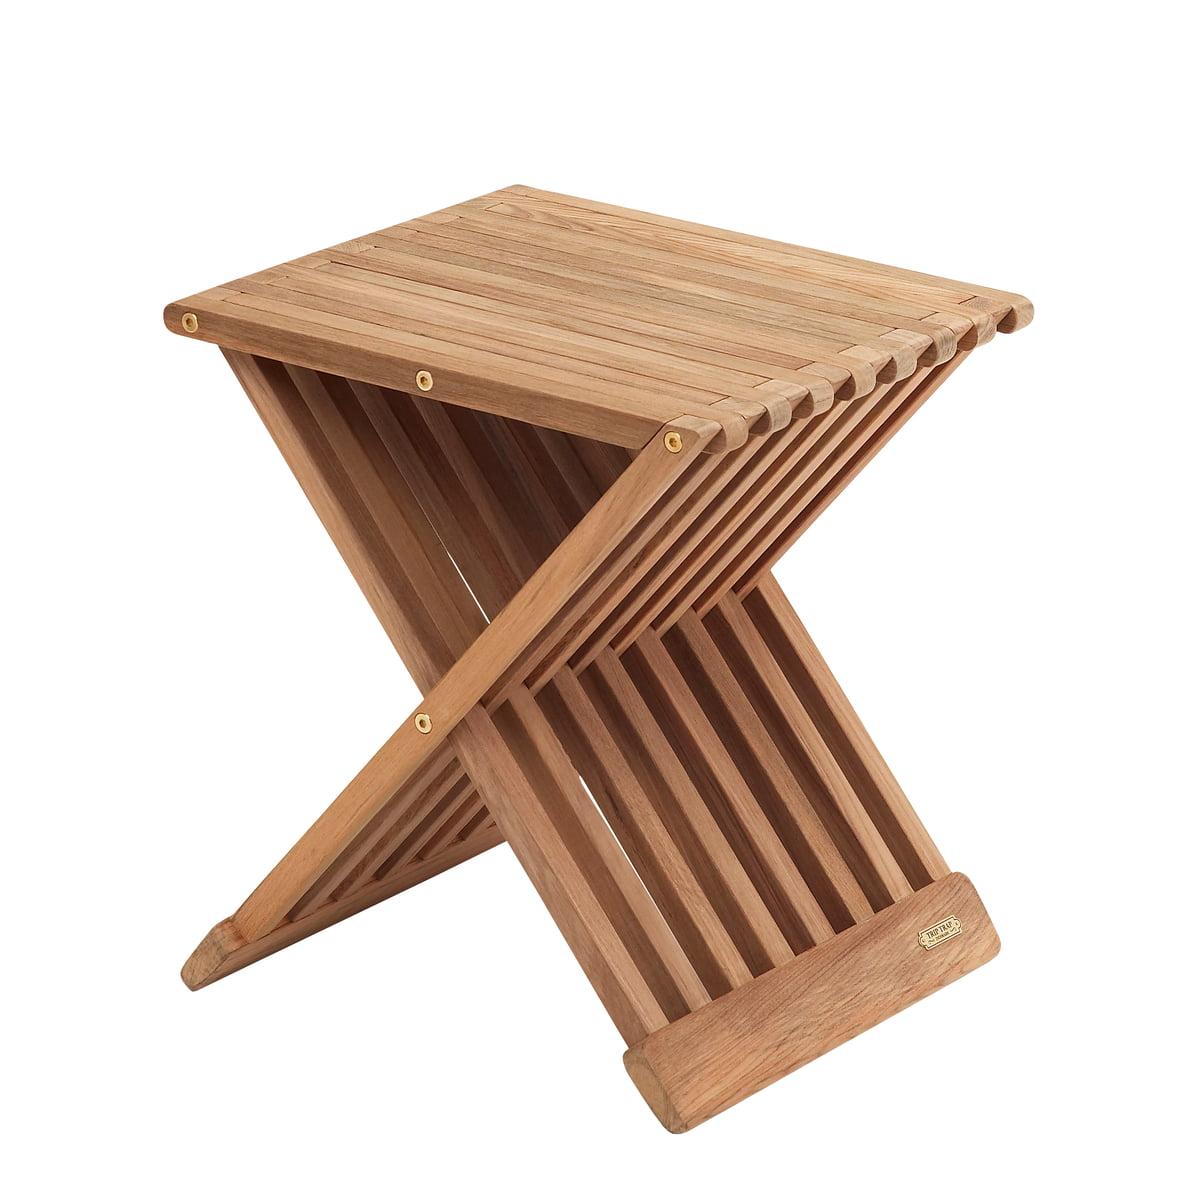 Astonishing Skagerak Fionia Stool Folding Chair Teak Alphanode Cool Chair Designs And Ideas Alphanodeonline